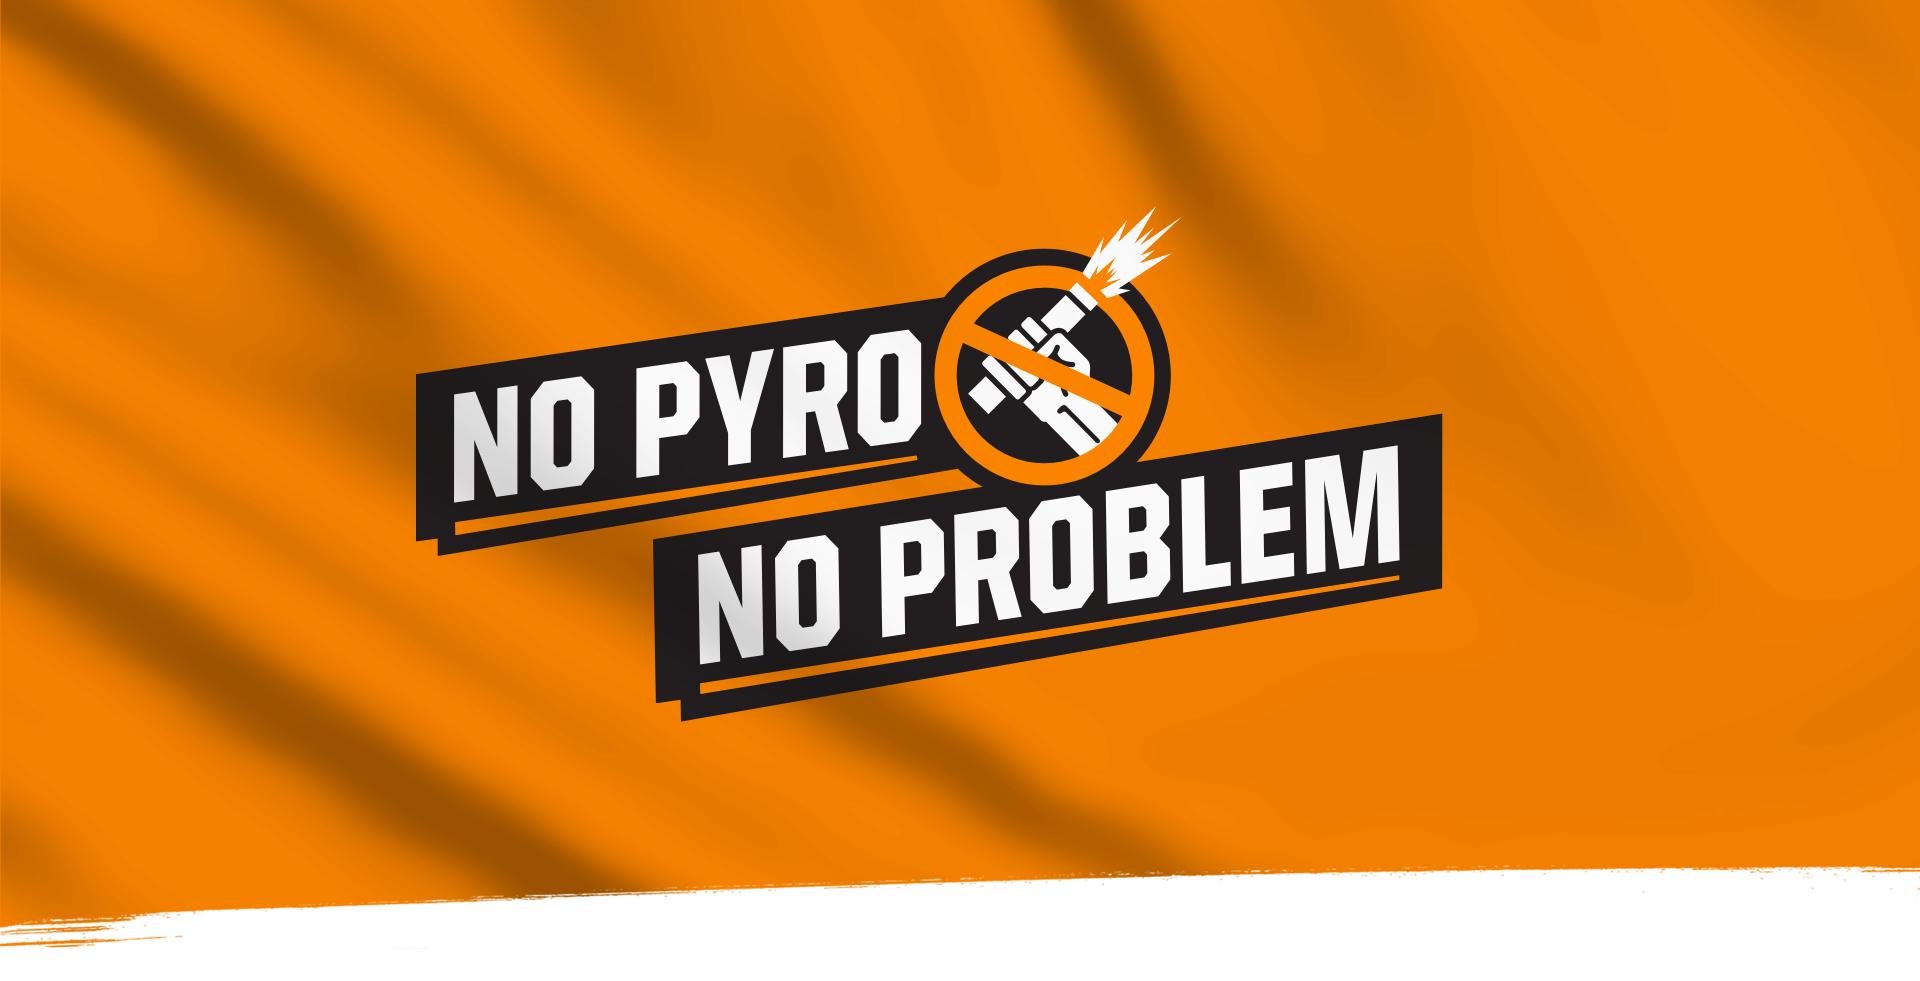 No Pyro No Problem